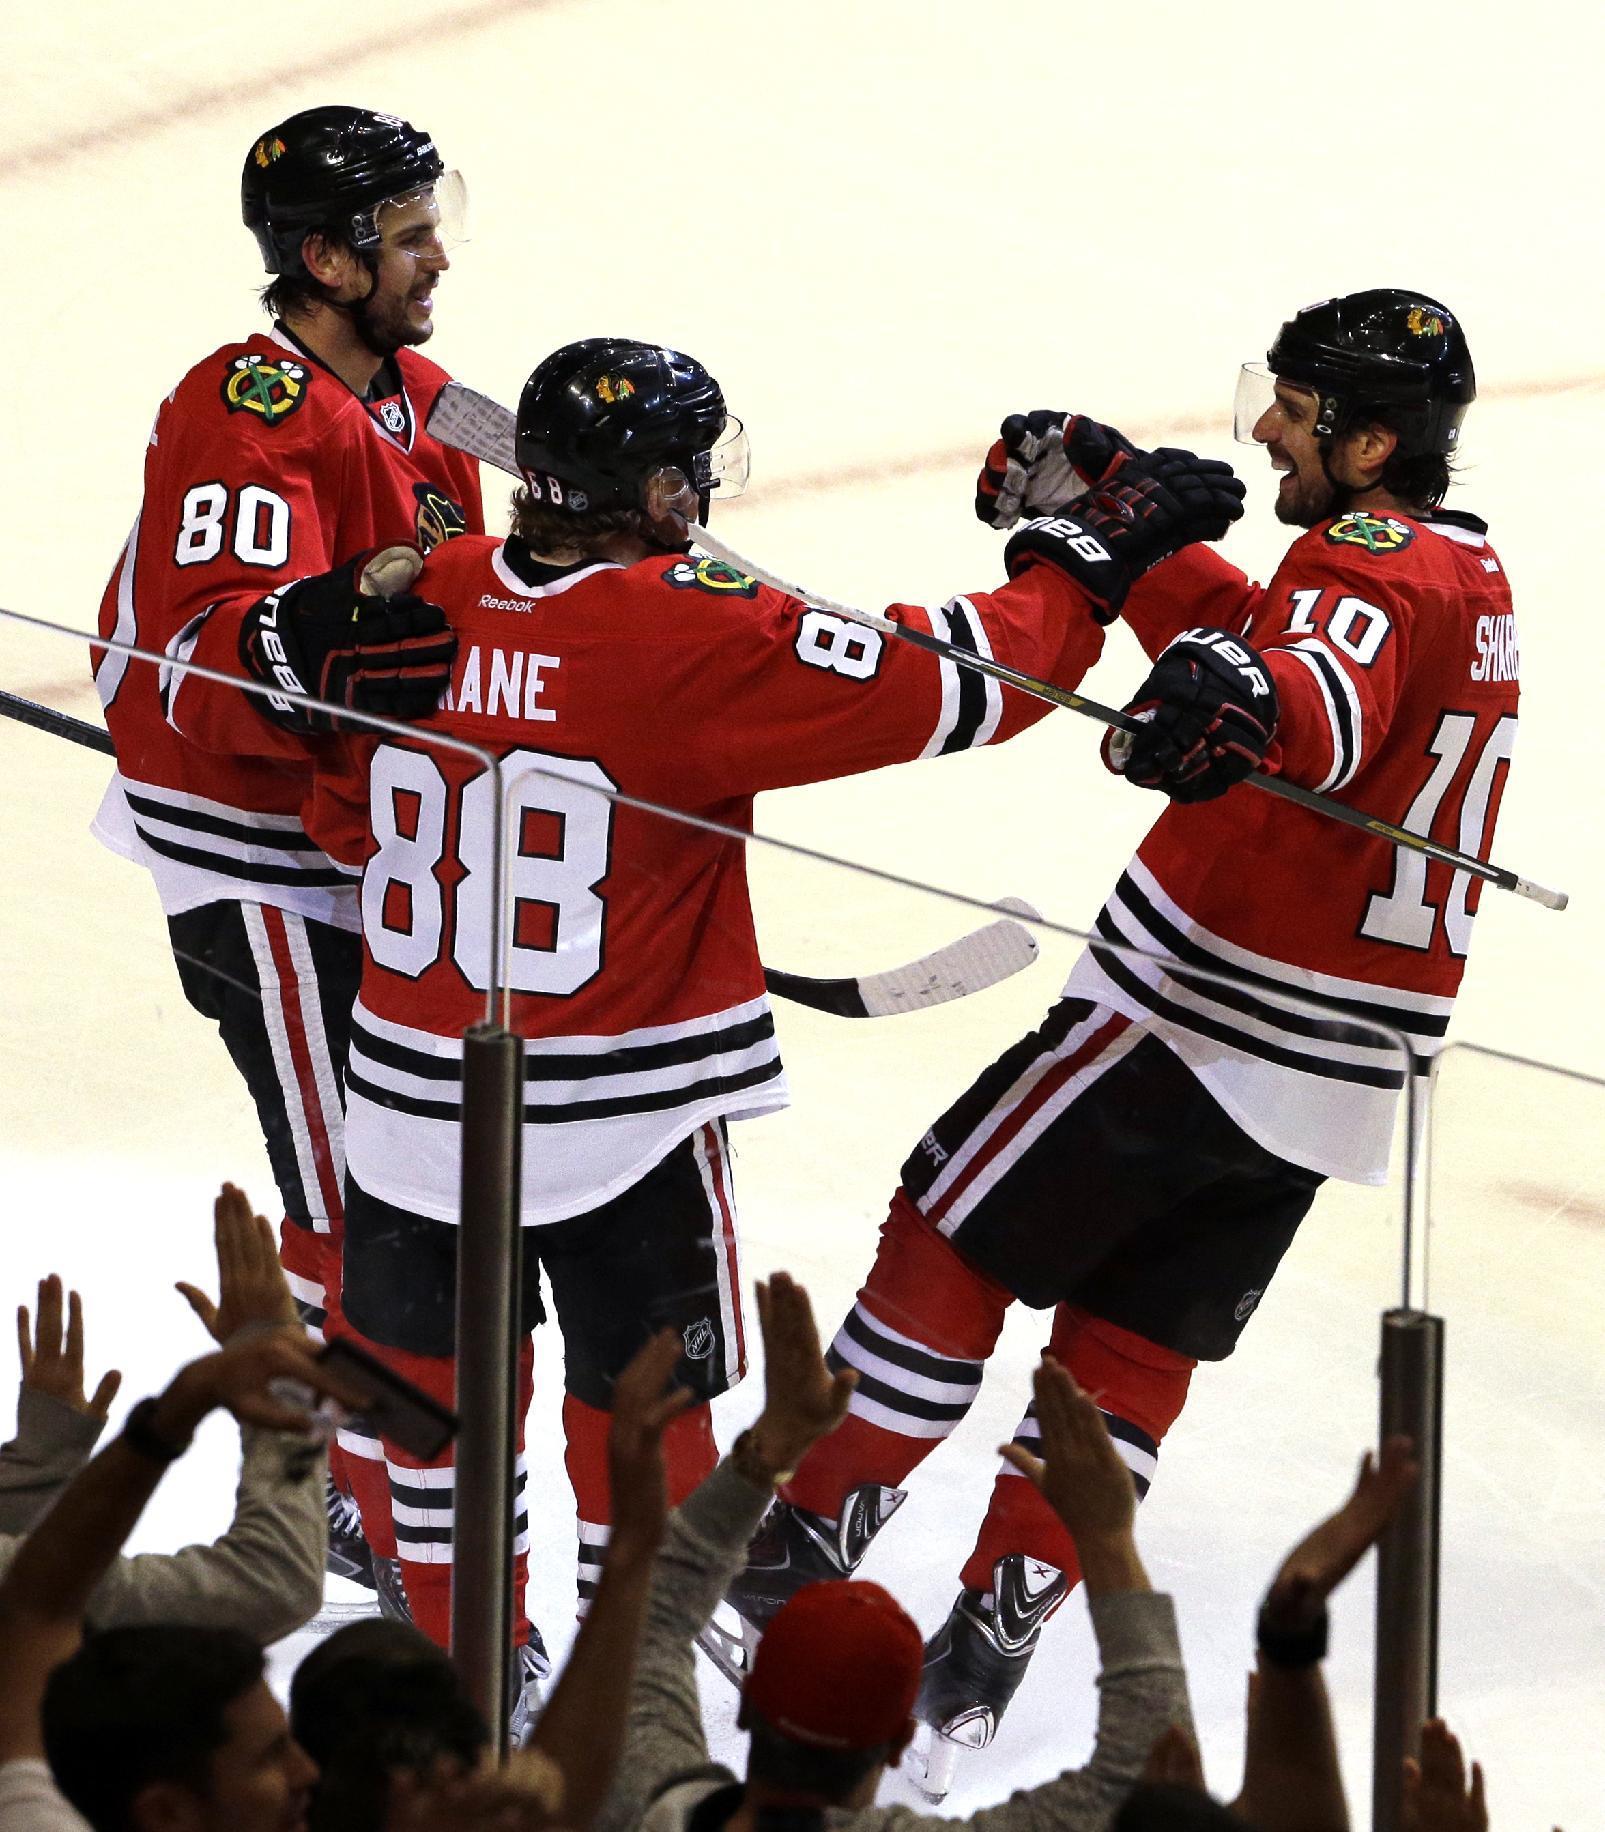 Kane leads Blackhawks past Wild 4-1